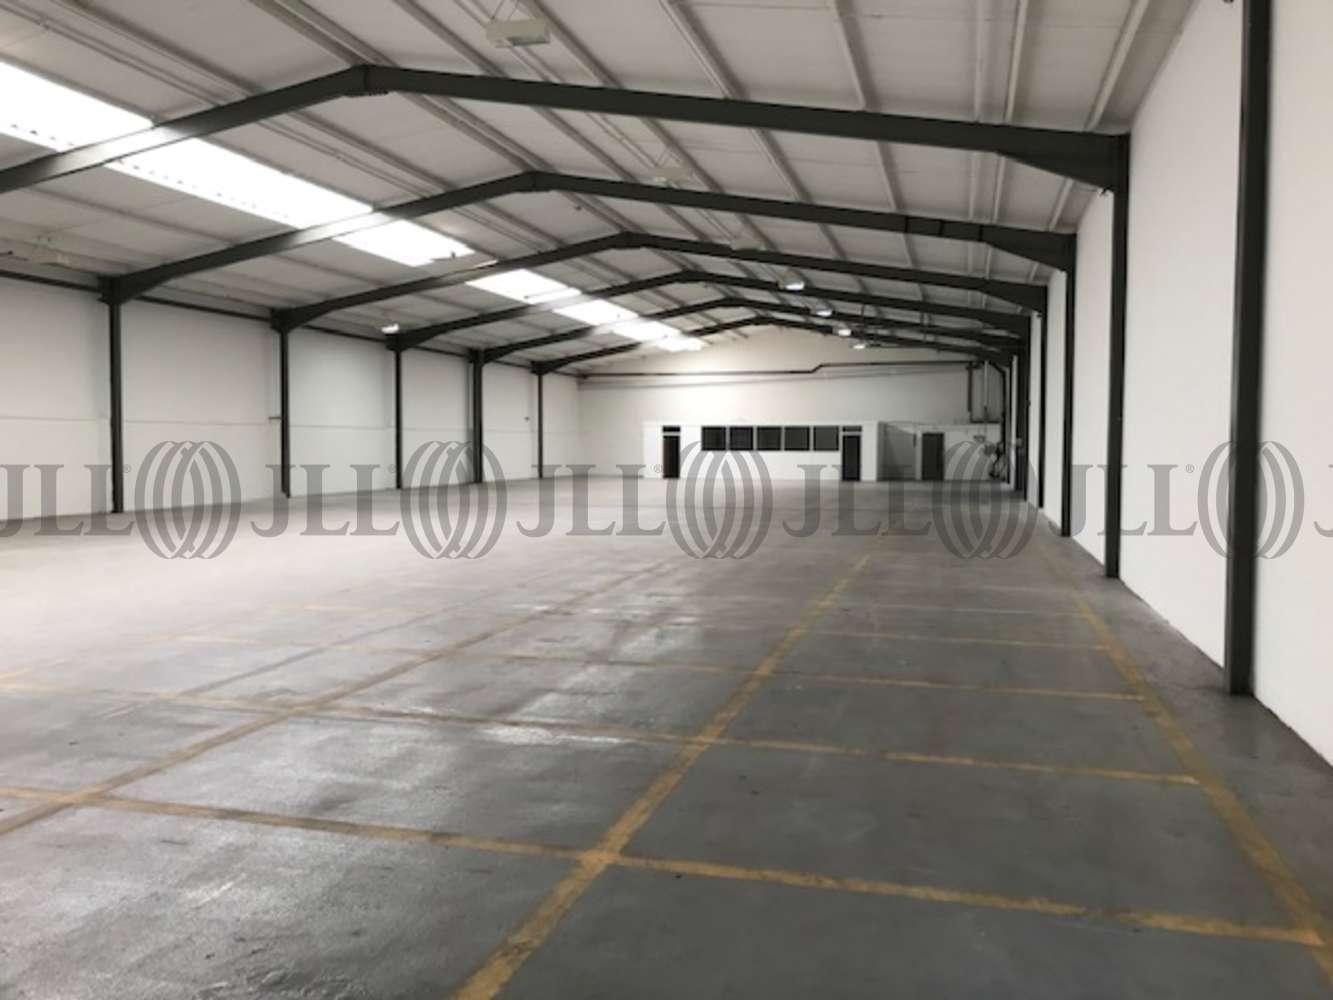 Industrial West byfleet, KT14 7JN - Units 6-8 Trackside Business Centre, Abbots Close